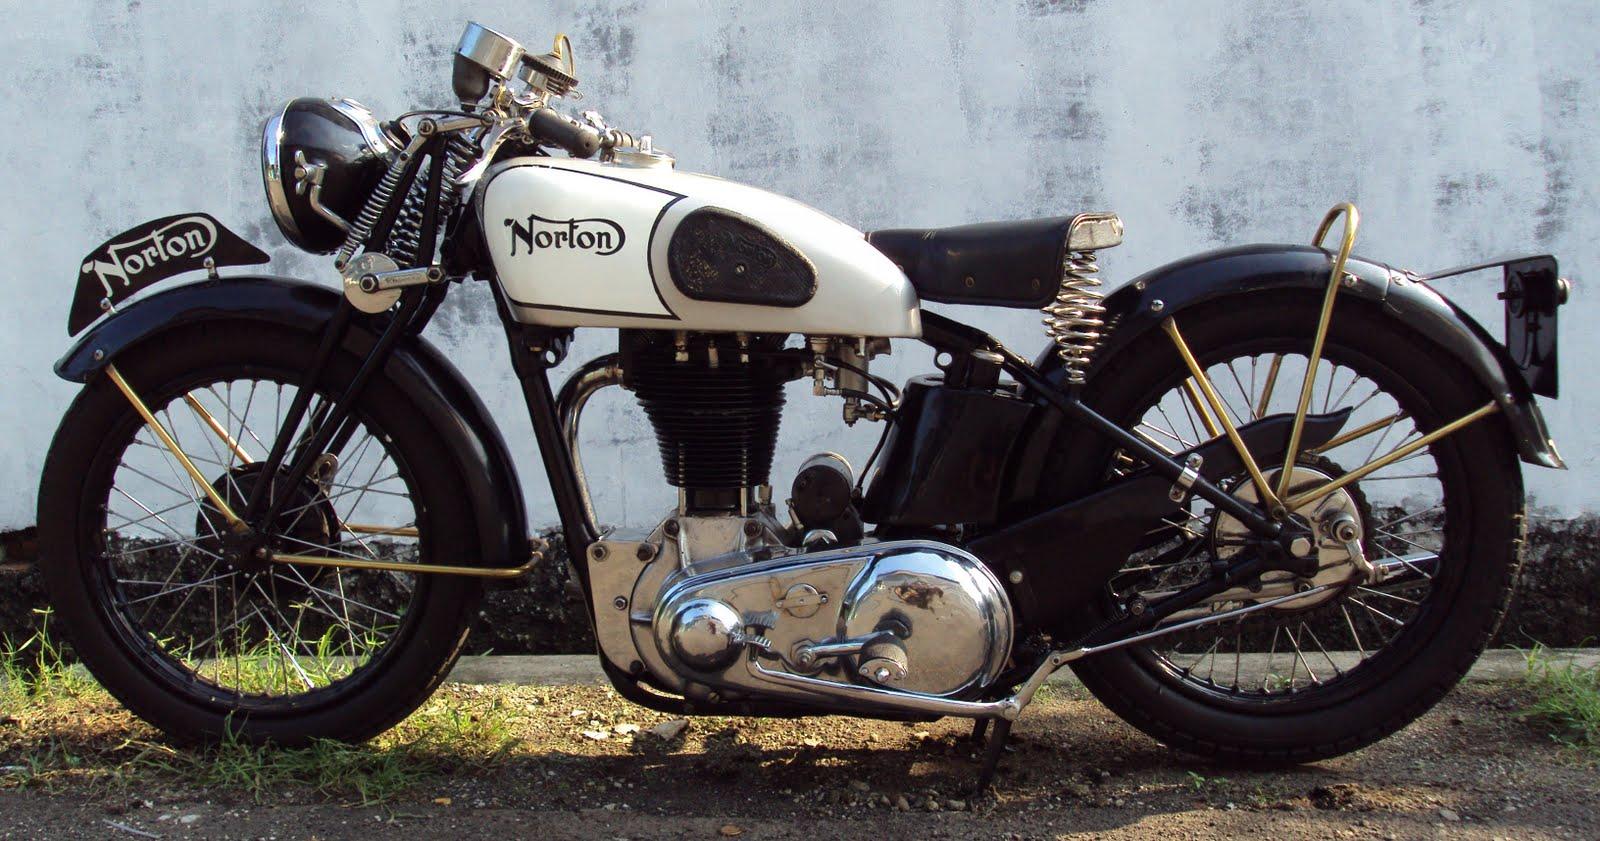 Vintage norton motorcycles april 2010 for The norton